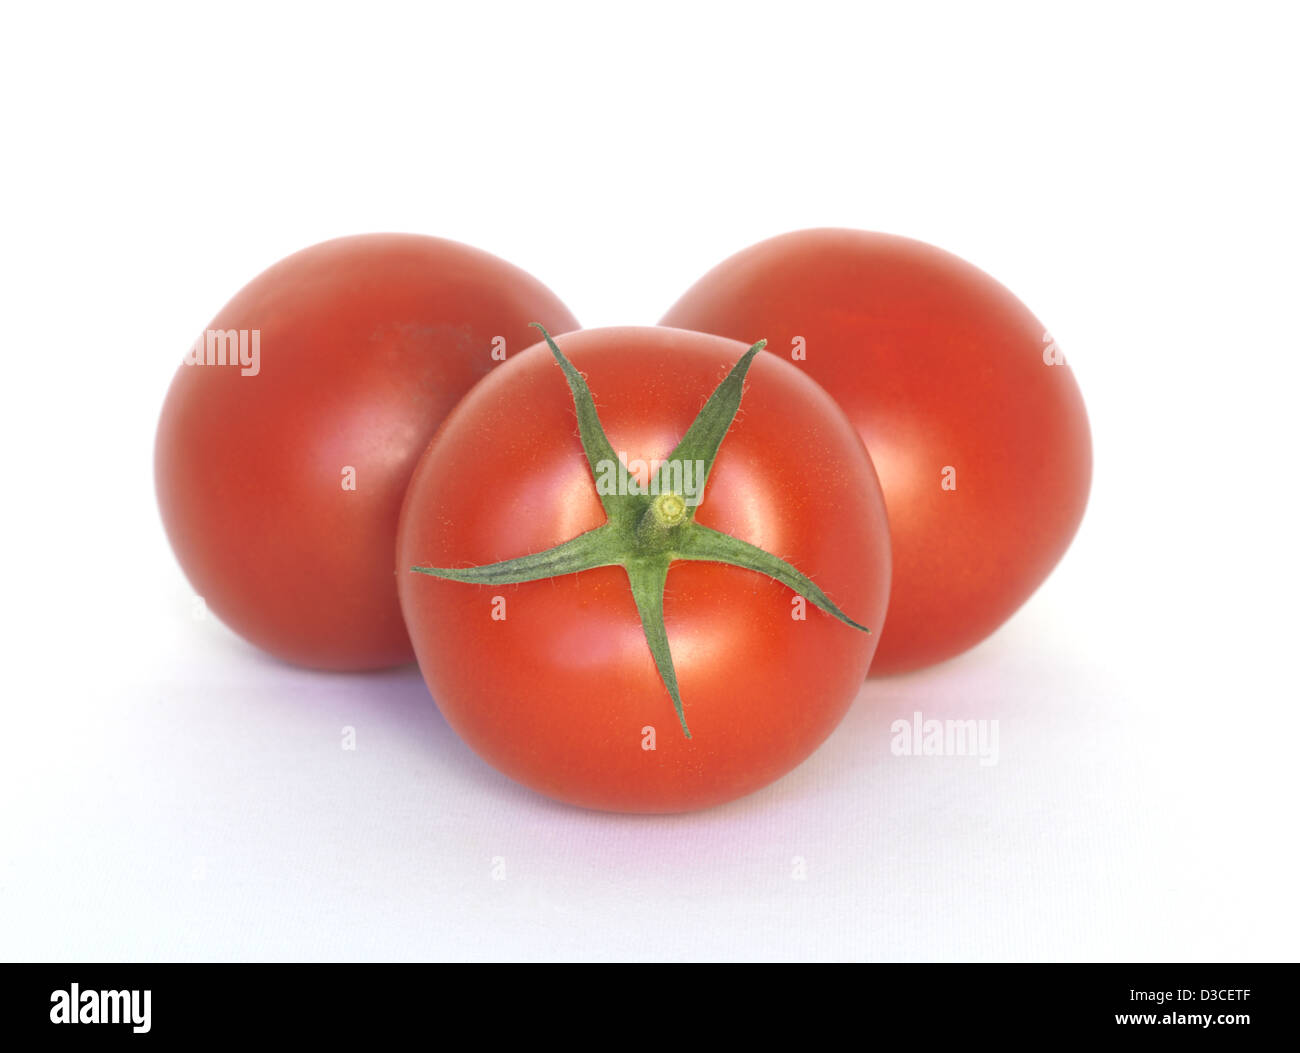 Tomato Vegetable Red Fresh - Stock Image